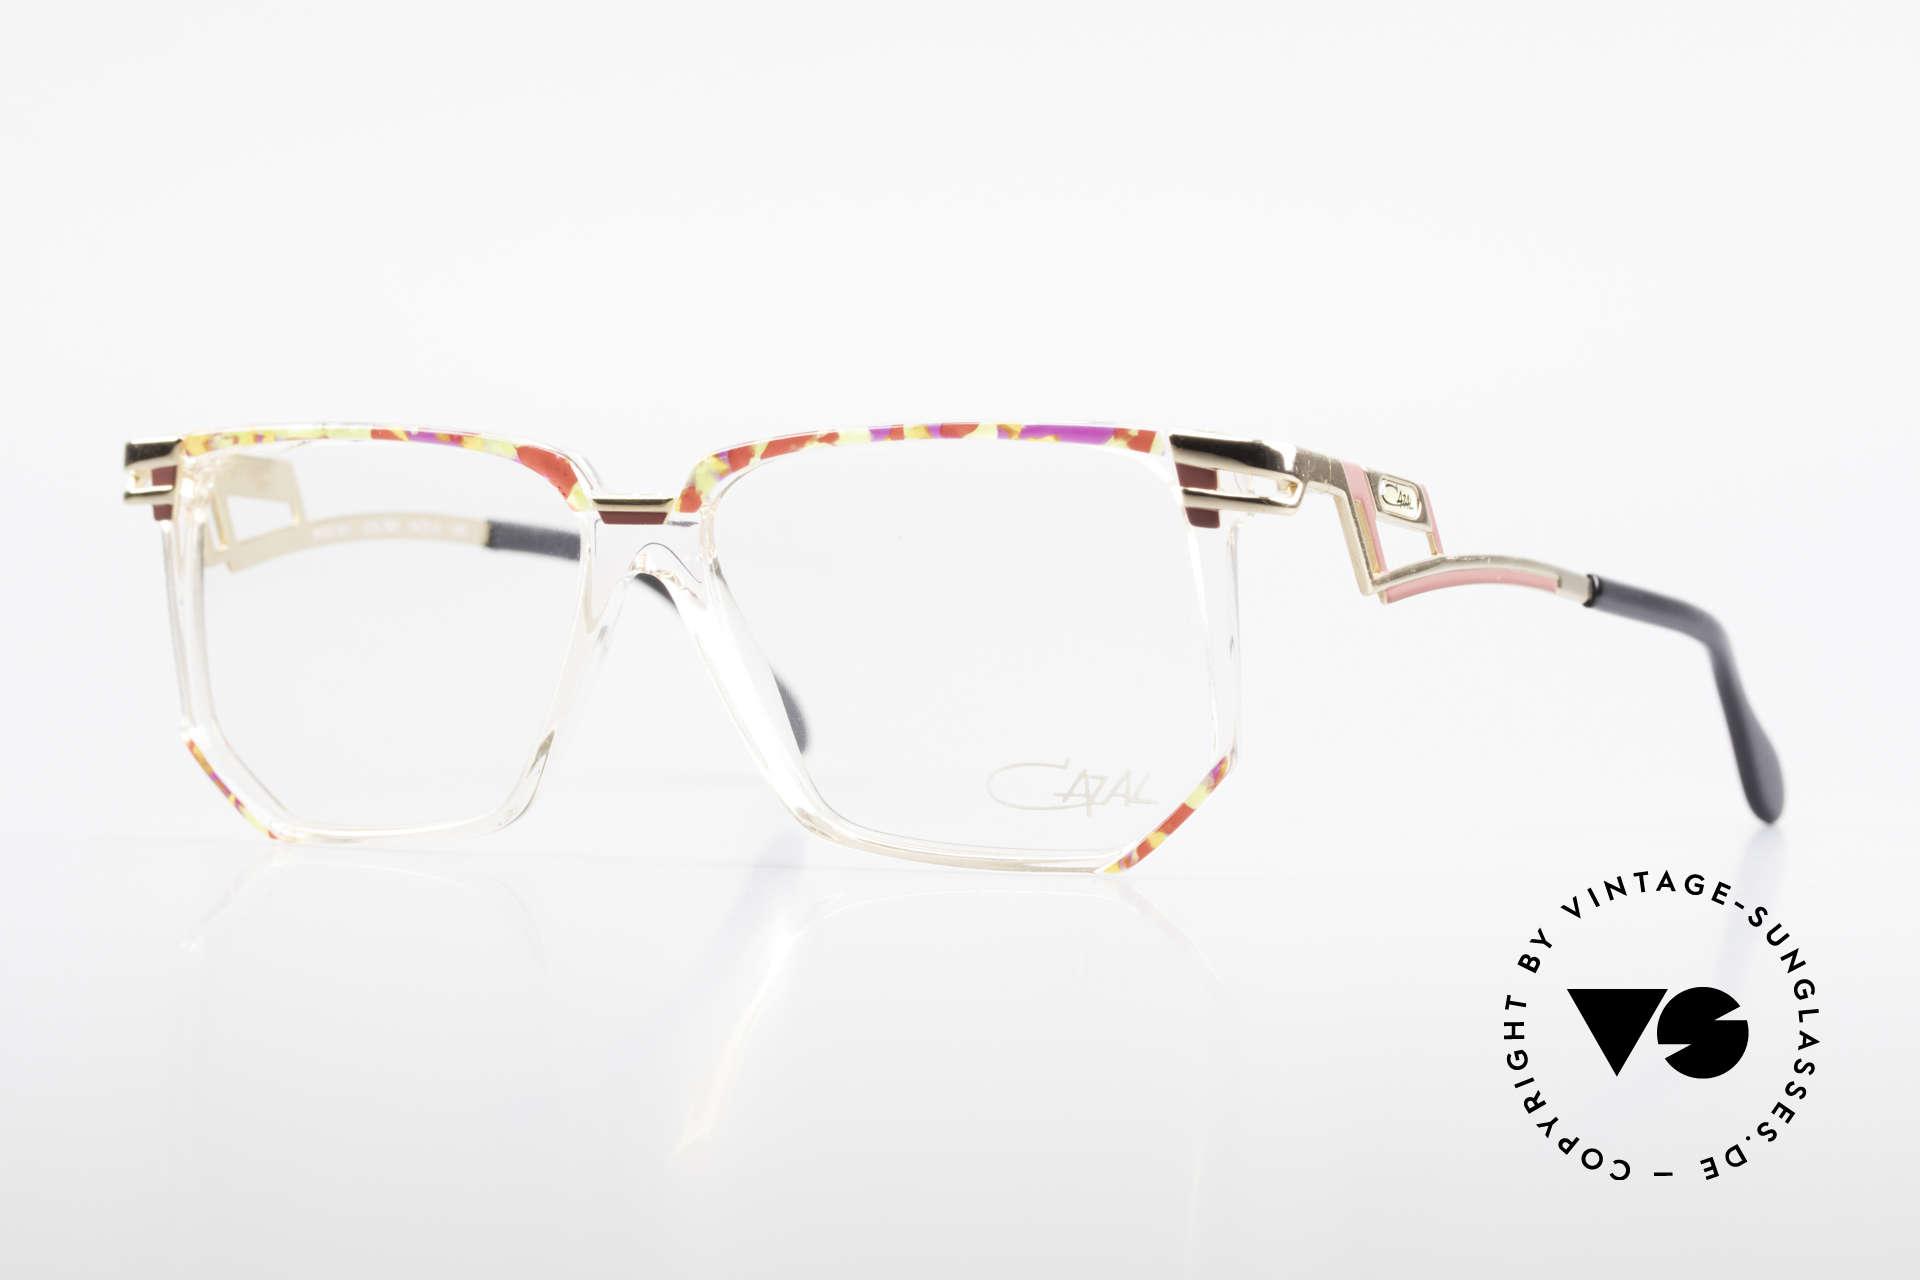 Cazal 351 Original Vintage Cazal HipHop, verrückte vintage Cazal Designerbrille der 80er/90er, Passend für Damen